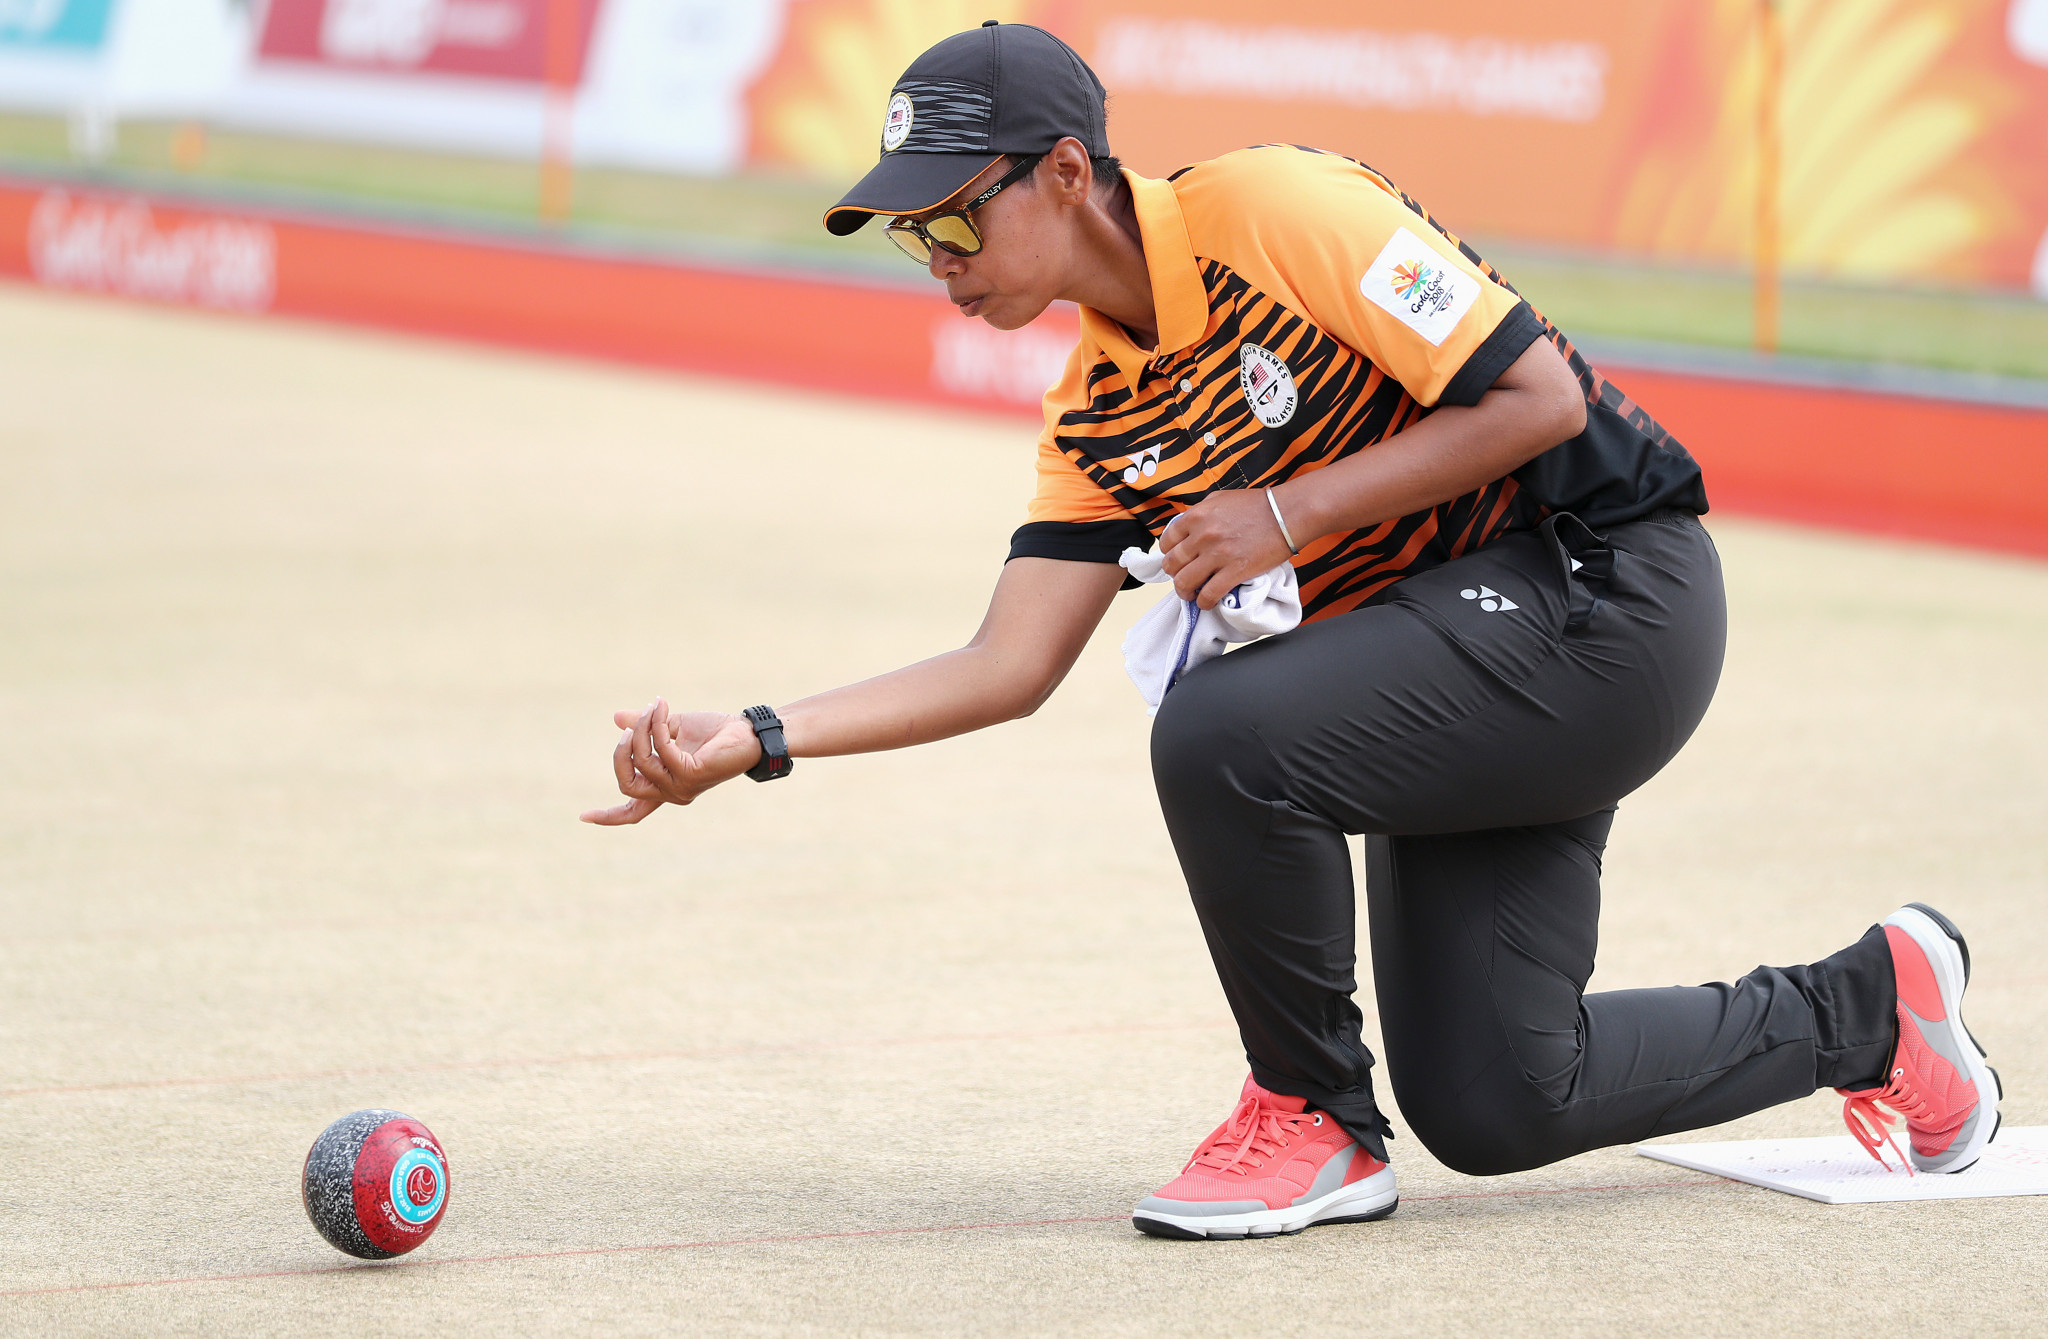 Malaysia's Siti Zalina Ahmad was one of the two beaten semi-finalists ©Getty Images